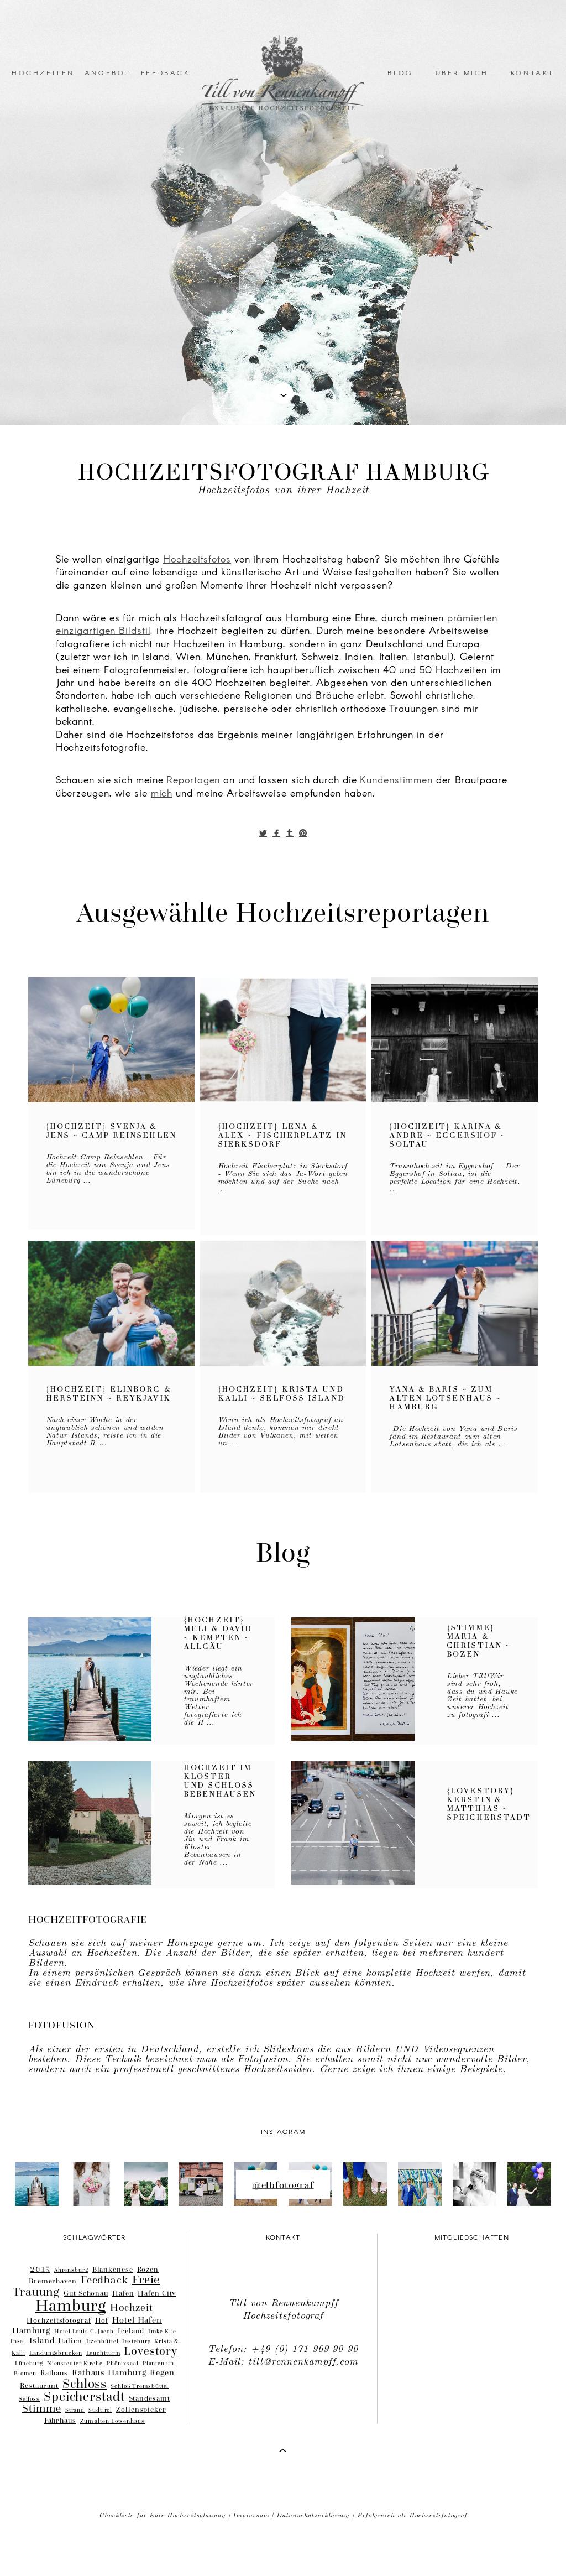 Till Von Rennenkampff Wedding Photography Competitors, Revenue and ...